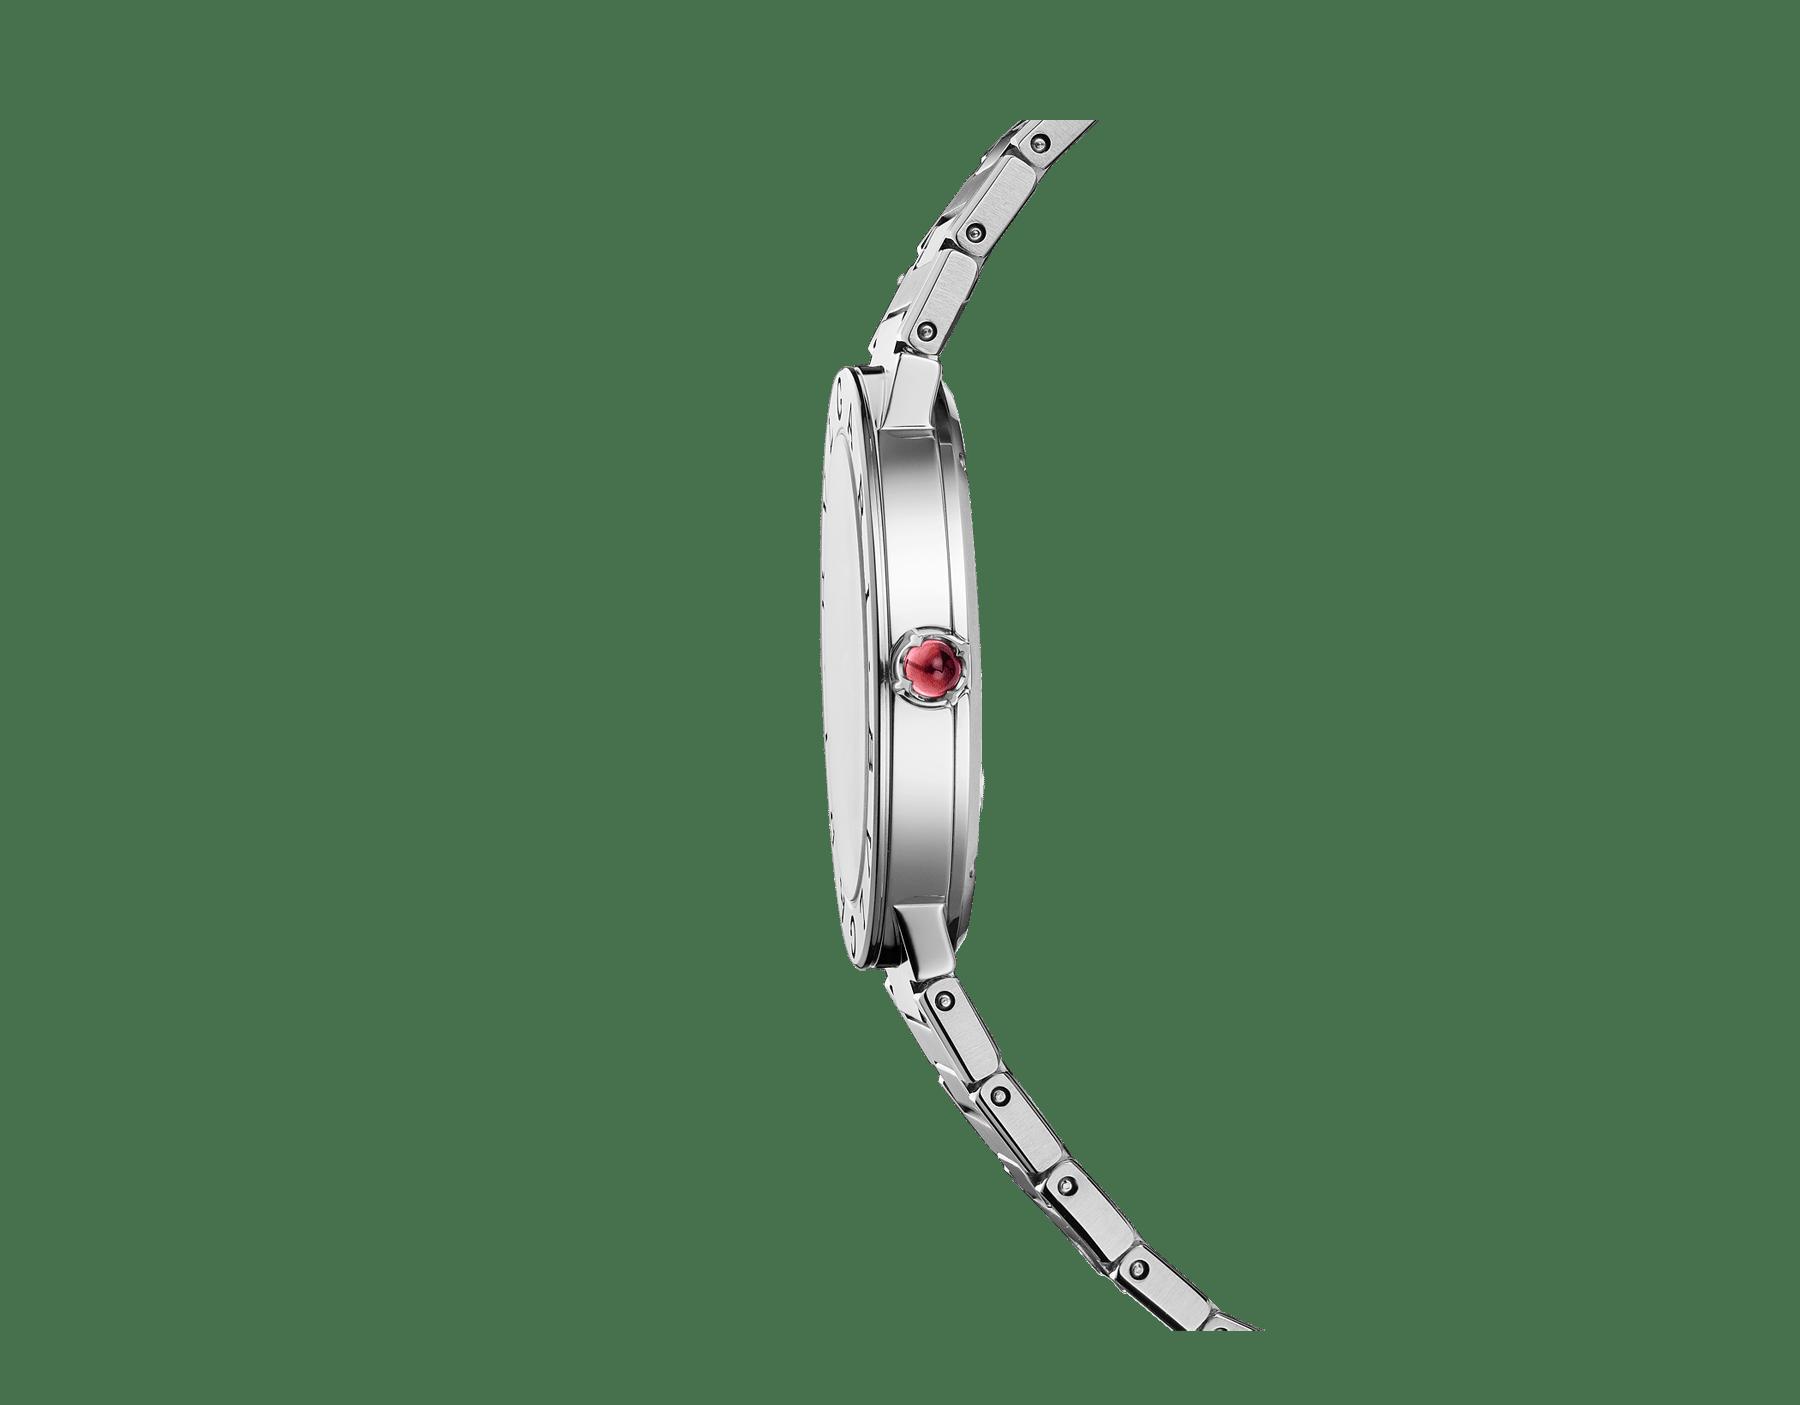 BVLGARI BVLGARI LADY 腕錶,精鋼錶殼和錶帶,精鋼錶圈鐫刻雙品牌標誌,綠色太陽放射紋錶盤。 103066 image 3